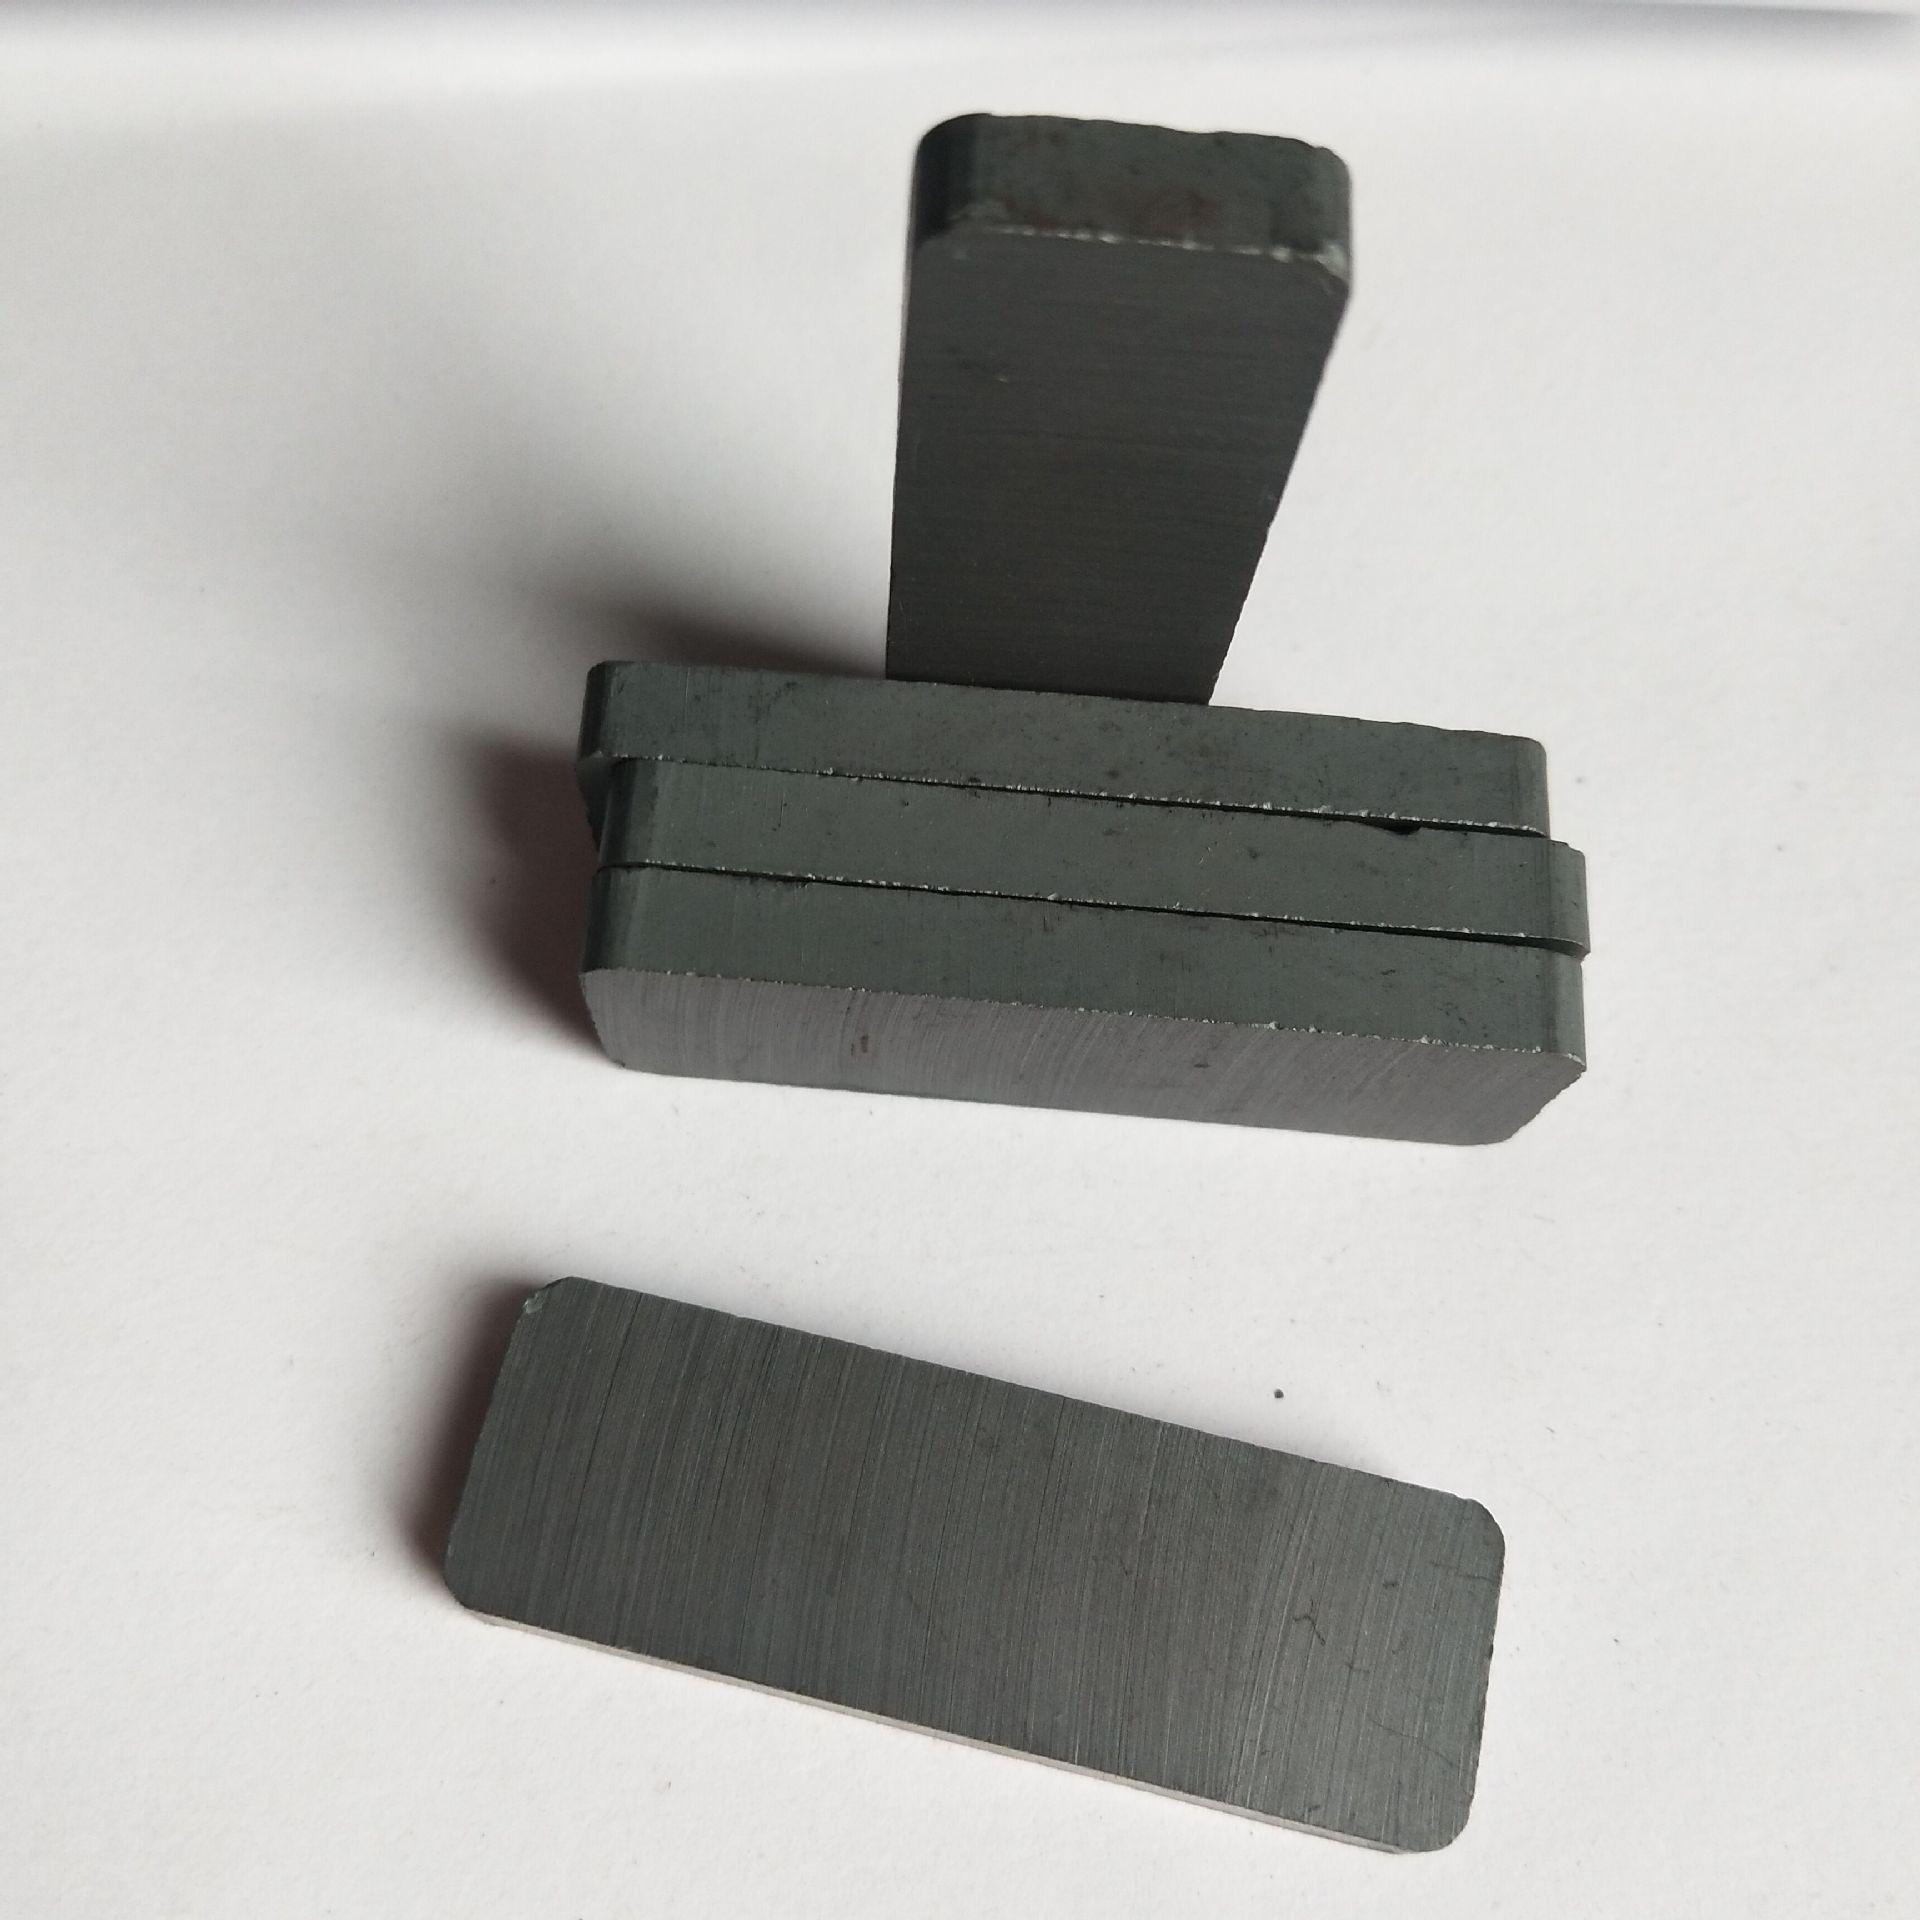 Sắt từ F45 * 15 * 5 Nam châm Ferrite Y30 Nam châm đen Nam châm đen Nam châm đối diện Nhà sản xuất Na